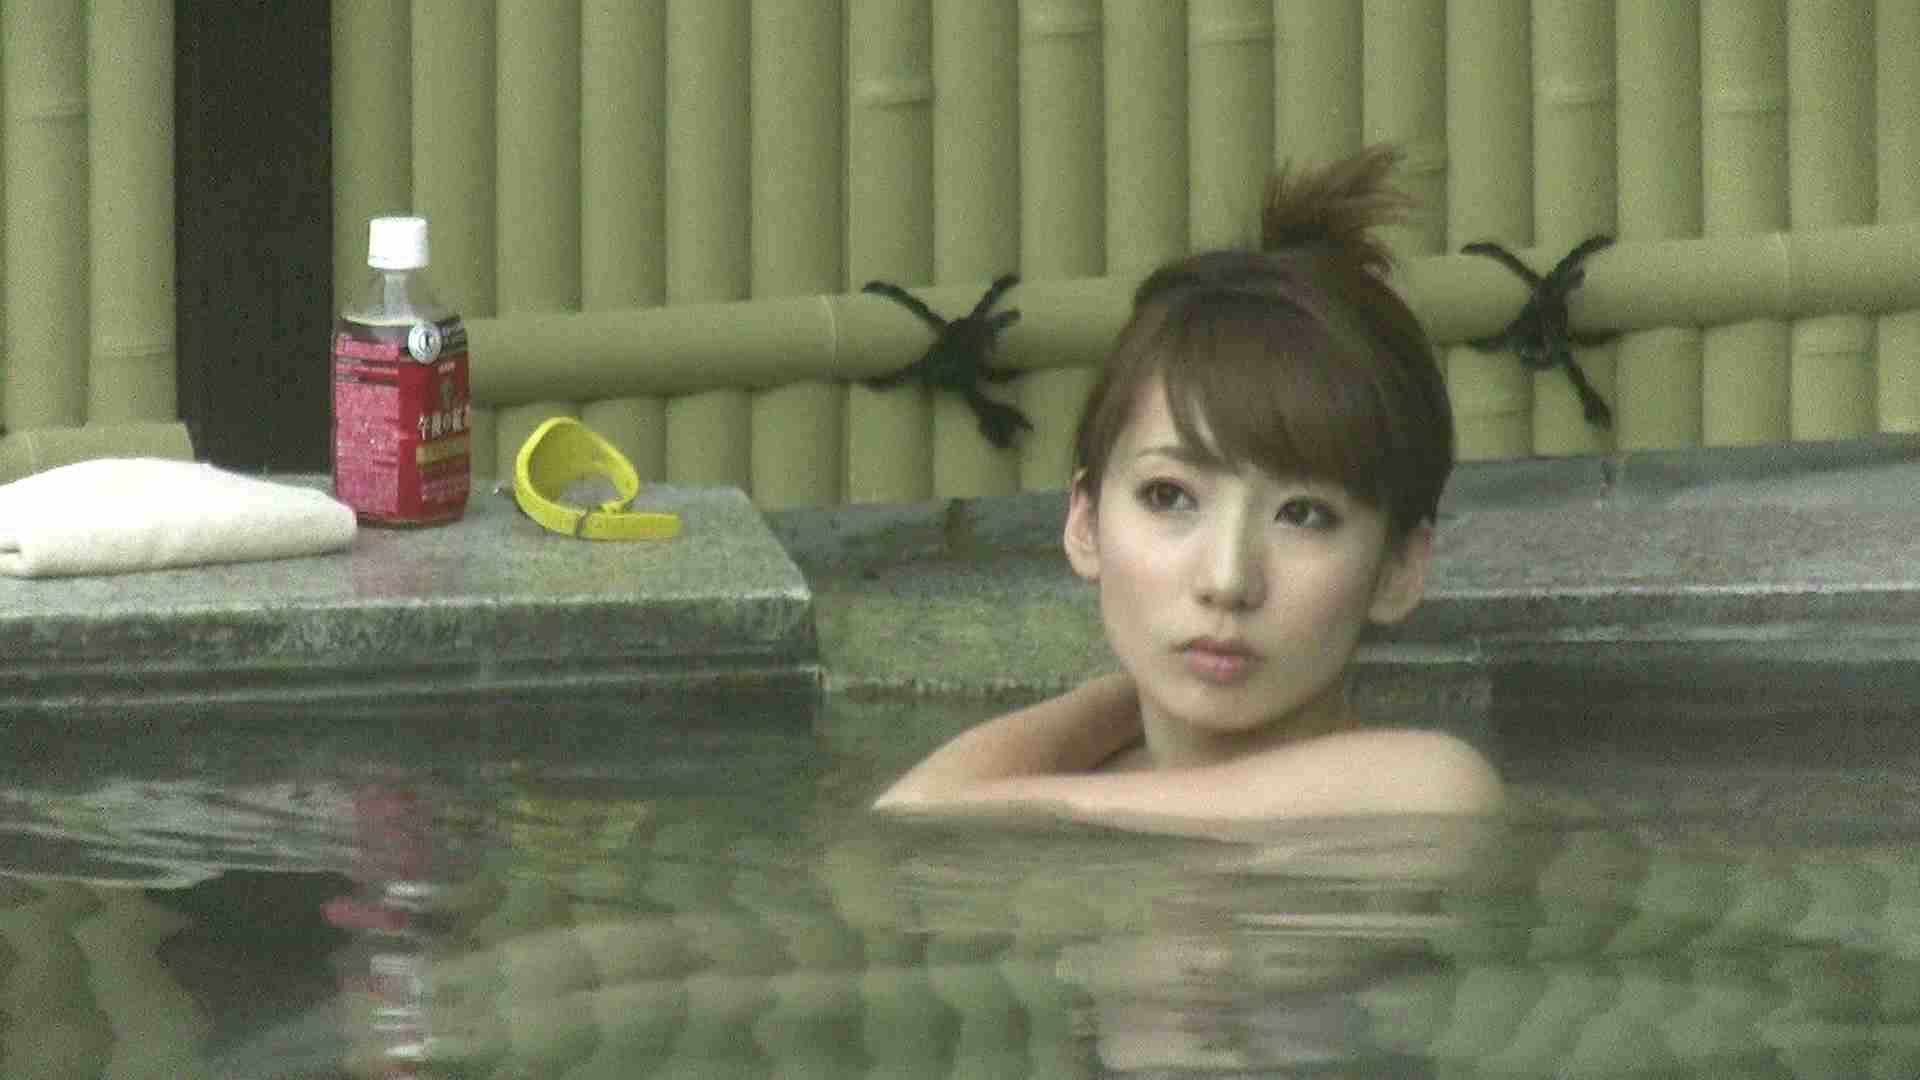 Aquaな露天風呂Vol.208 盗撮 隠し撮りオマンコ動画紹介 85画像 23